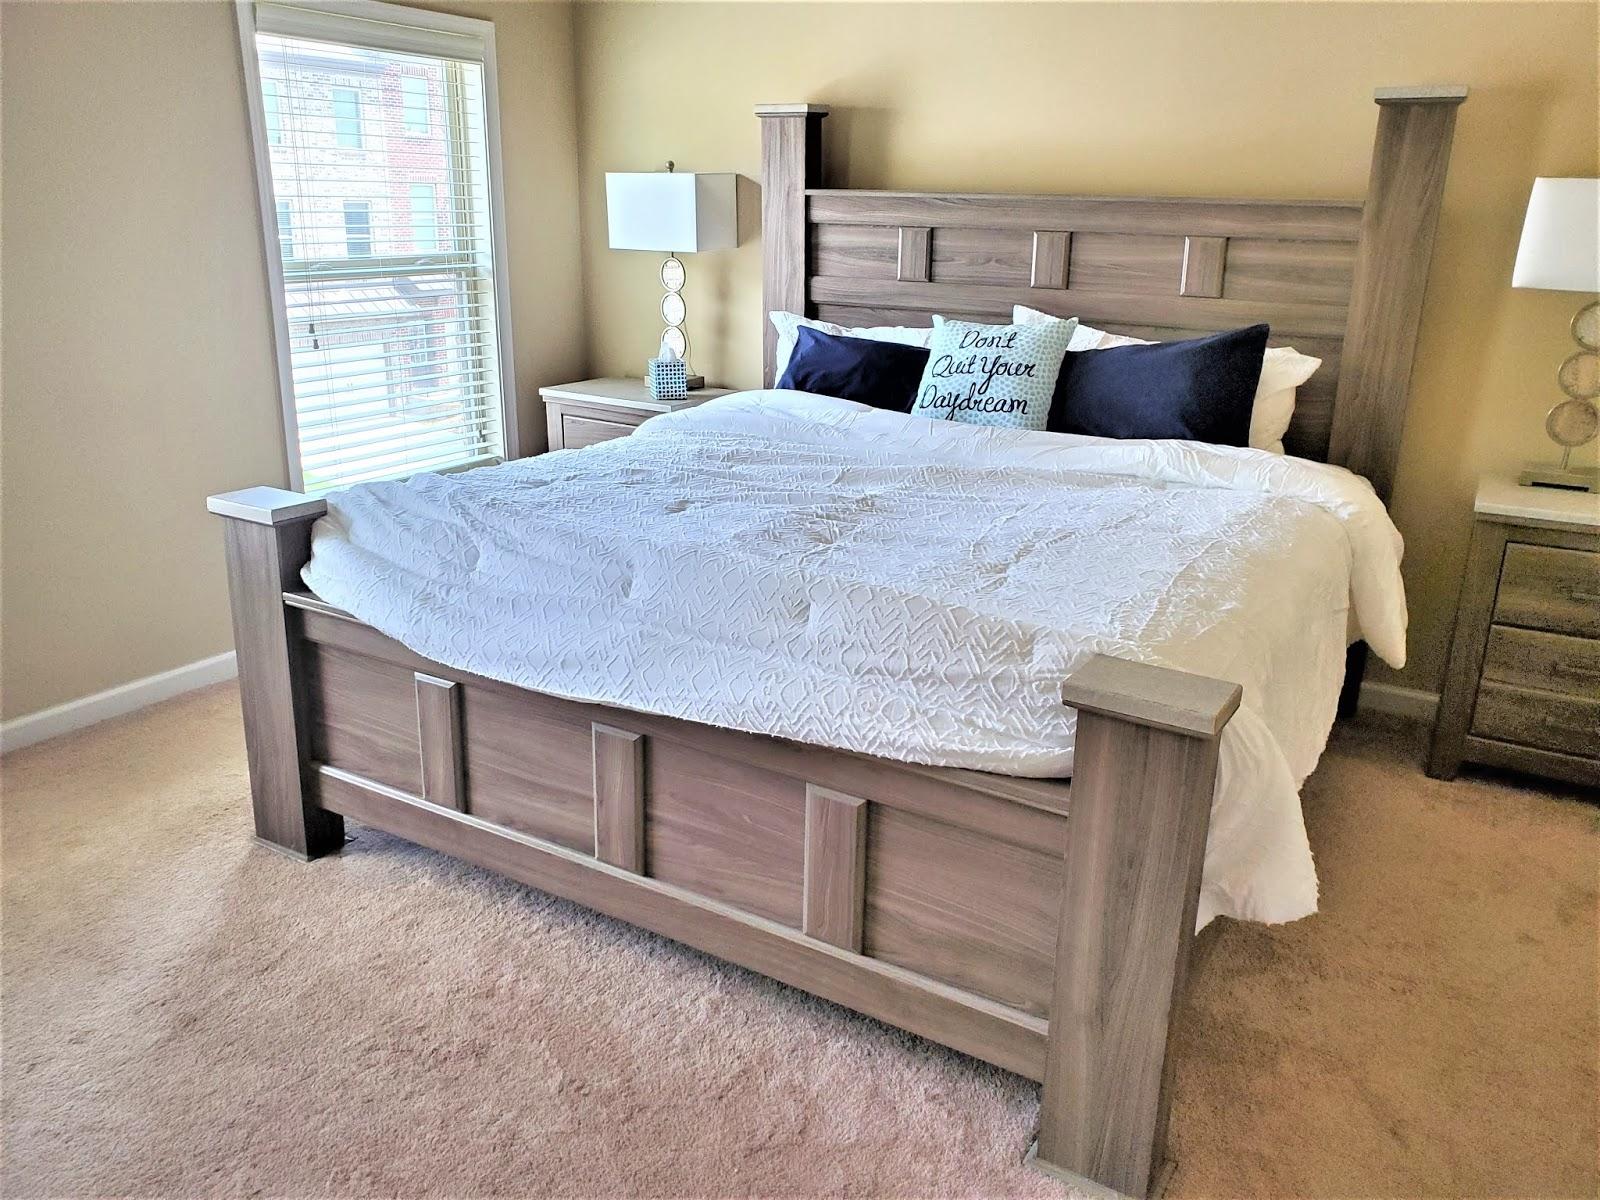 Linden Street: Monroe Comforter 3-PC Set